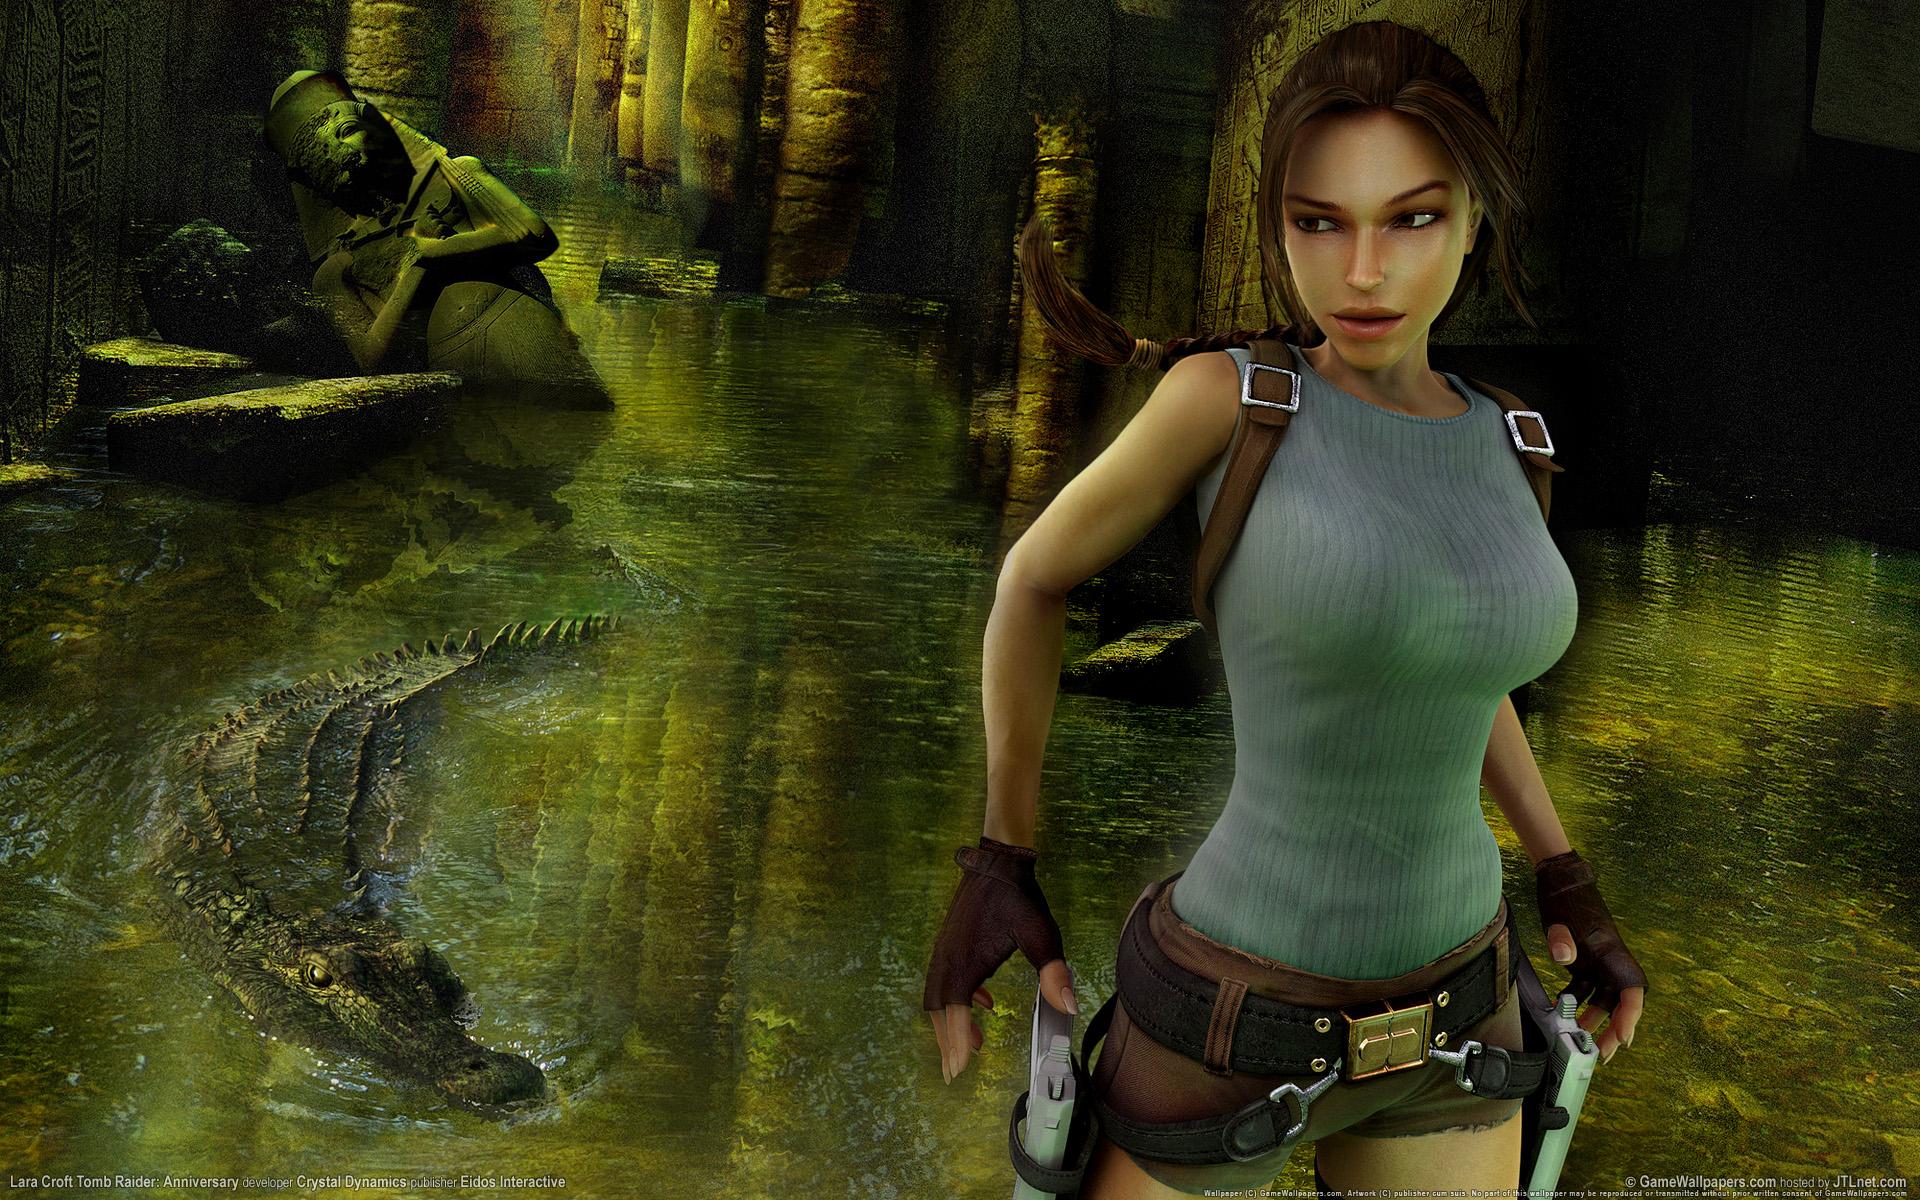 ... Tomb Raider Anniversary for Windows,XBOX(7) ...